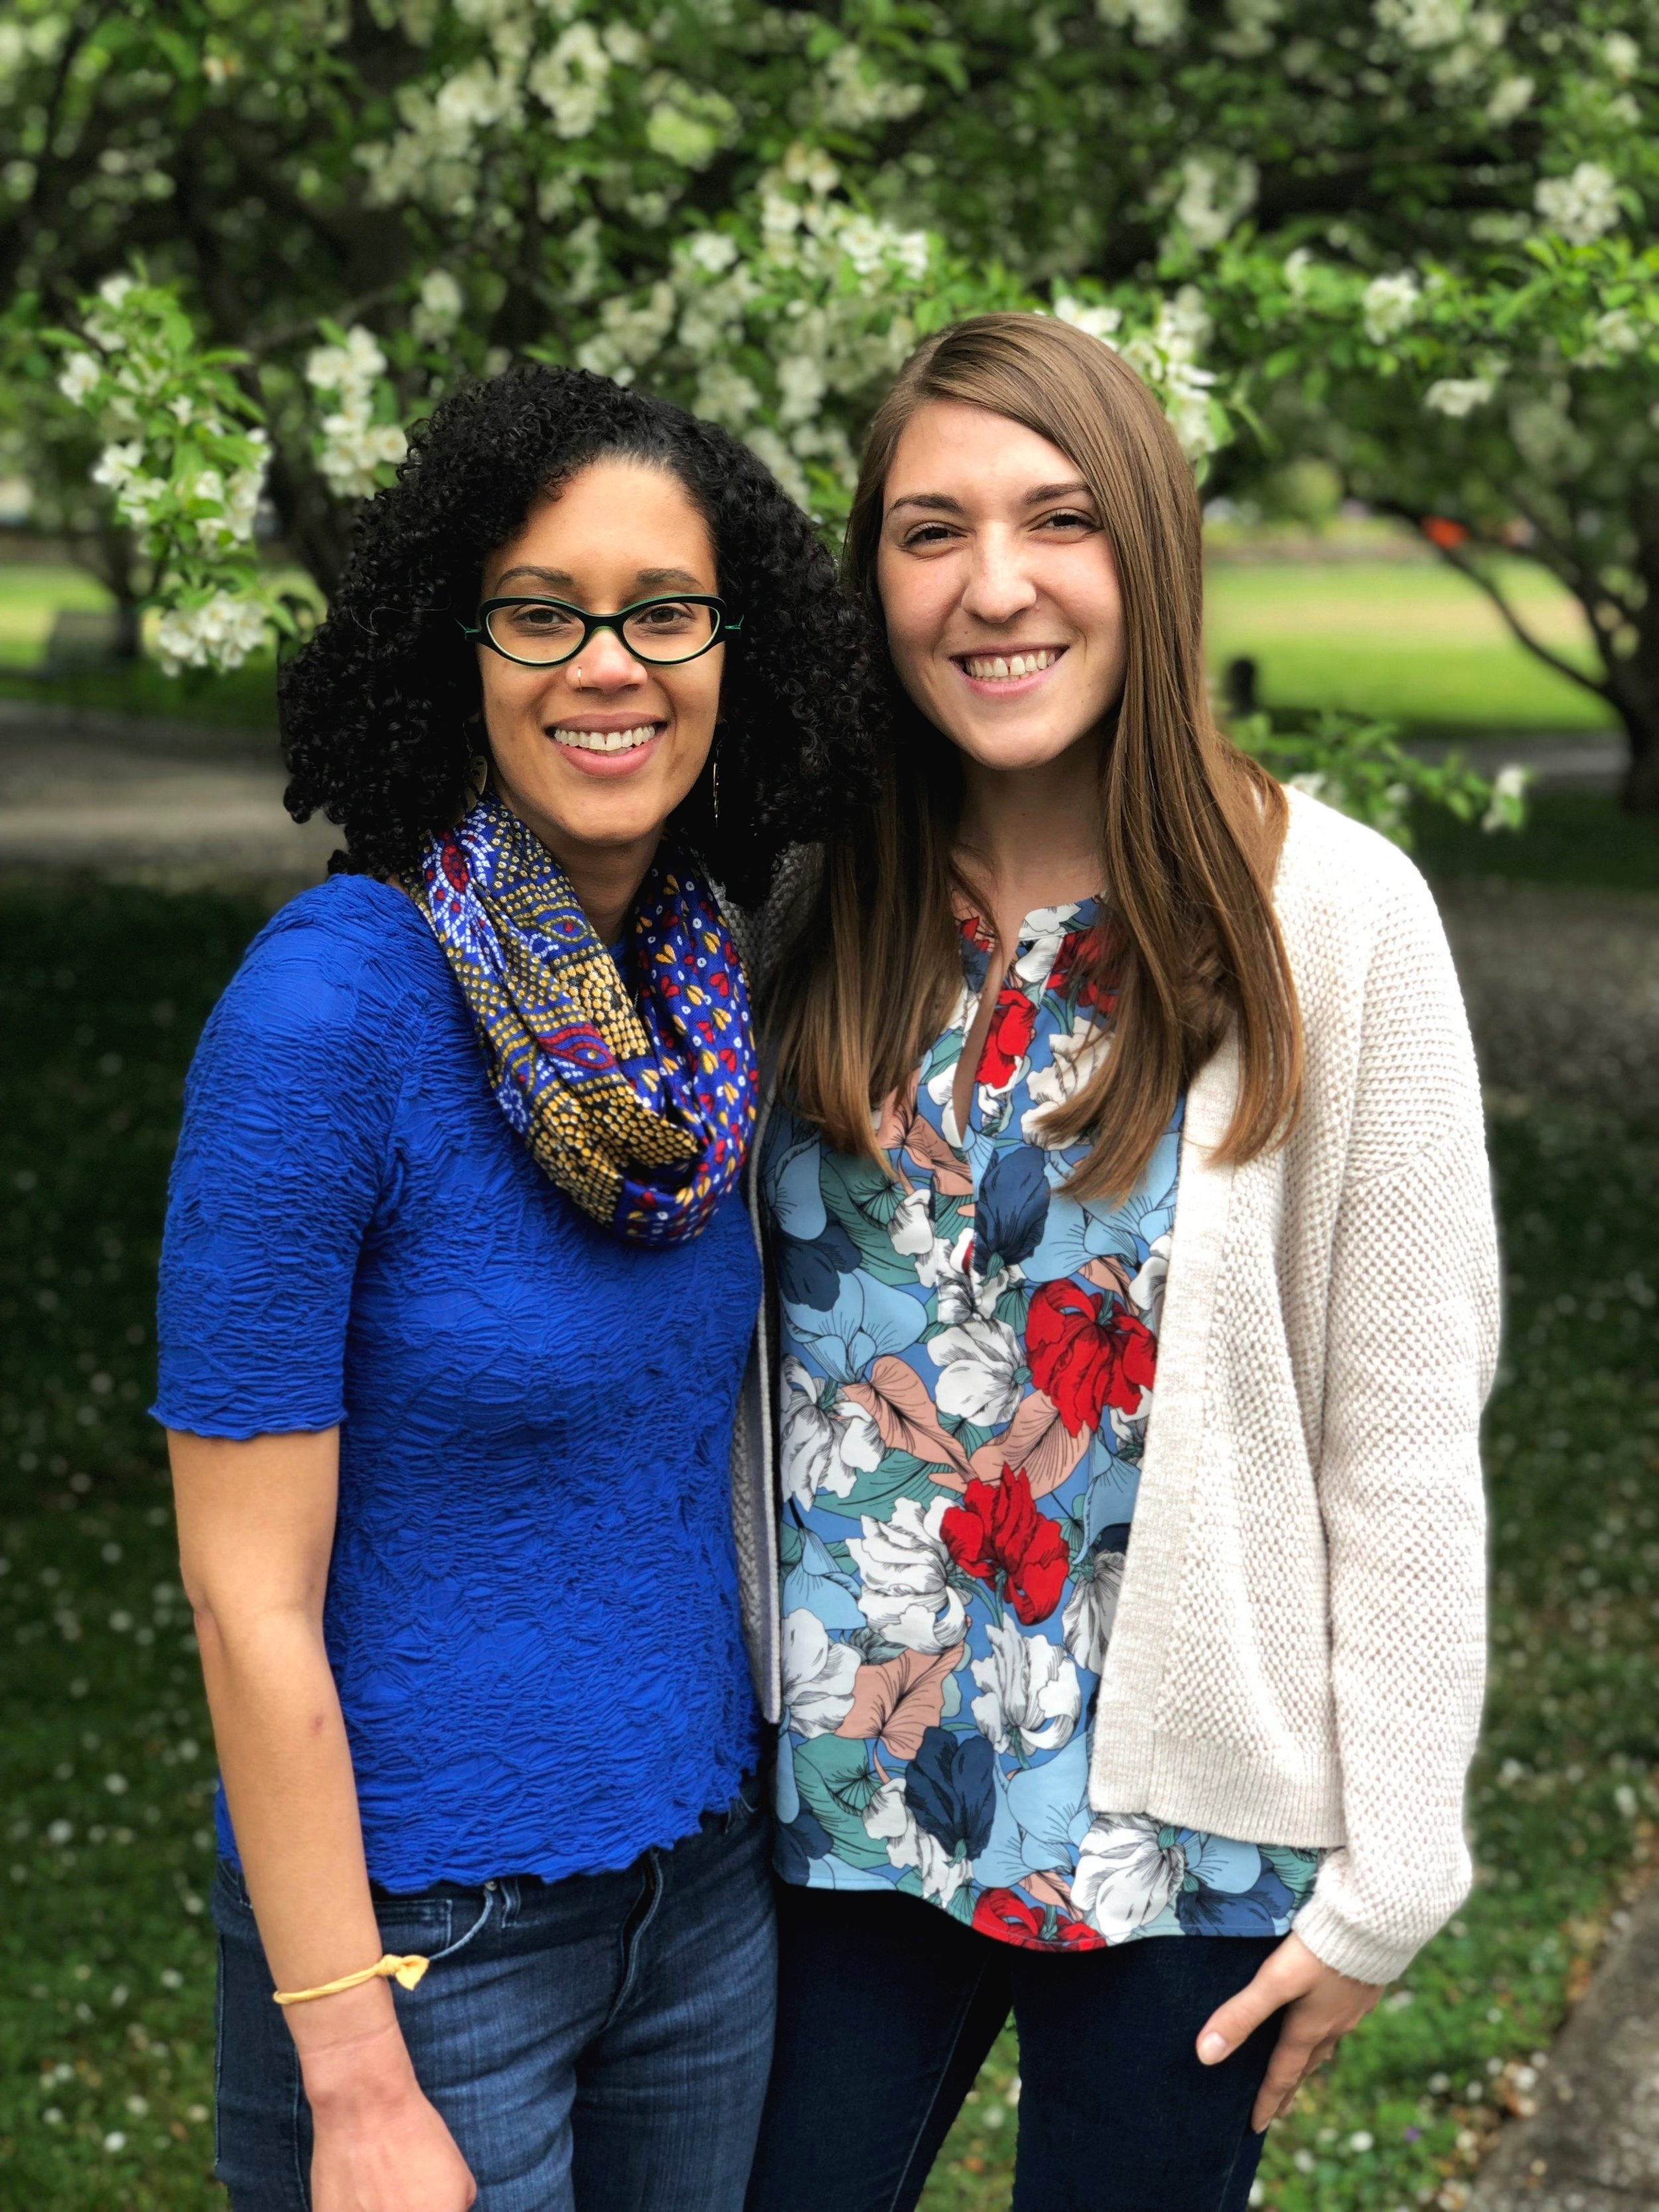 Small Business Coordinator Johnisha Levi (left) and Programs Coordinator Maria Marton are the newest staff members at the Nashville Farmers' Market.